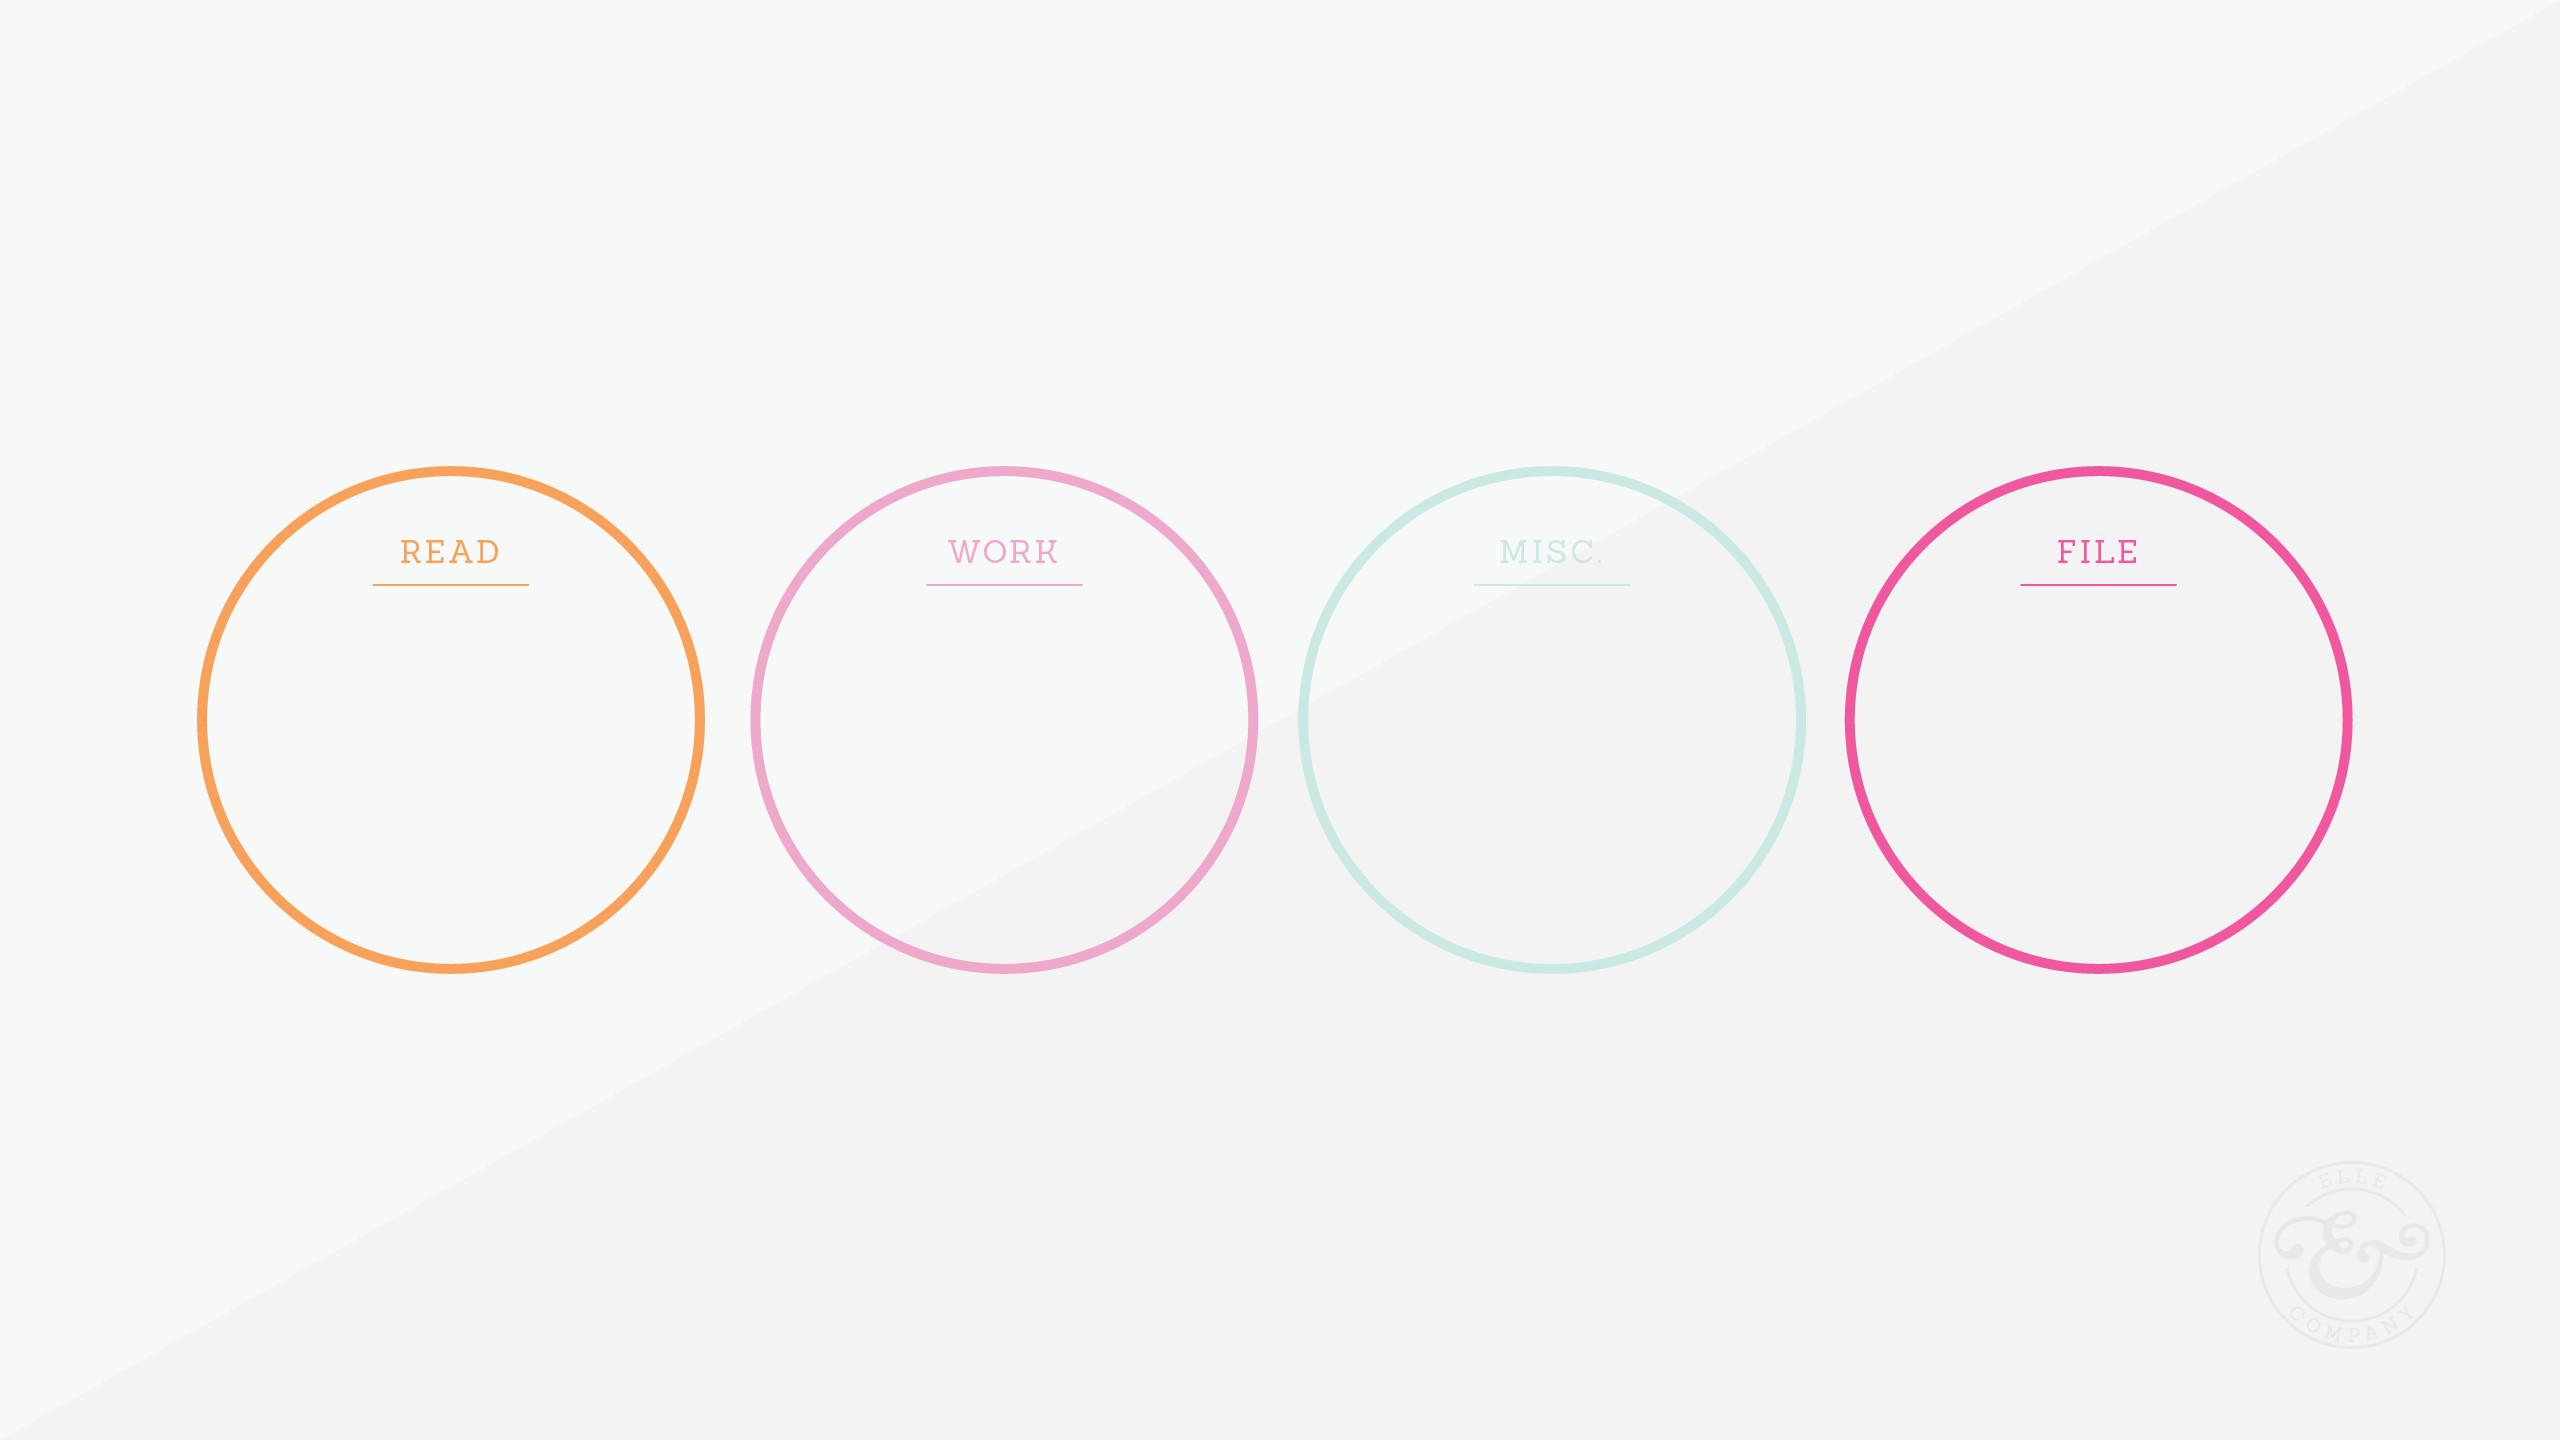 Pretty minimal desktop organizer wallpaper background – love the clean  simplicity! | Teknik | Pinterest | Desktop organizer wallpaper, Wallpaper  backgrounds …